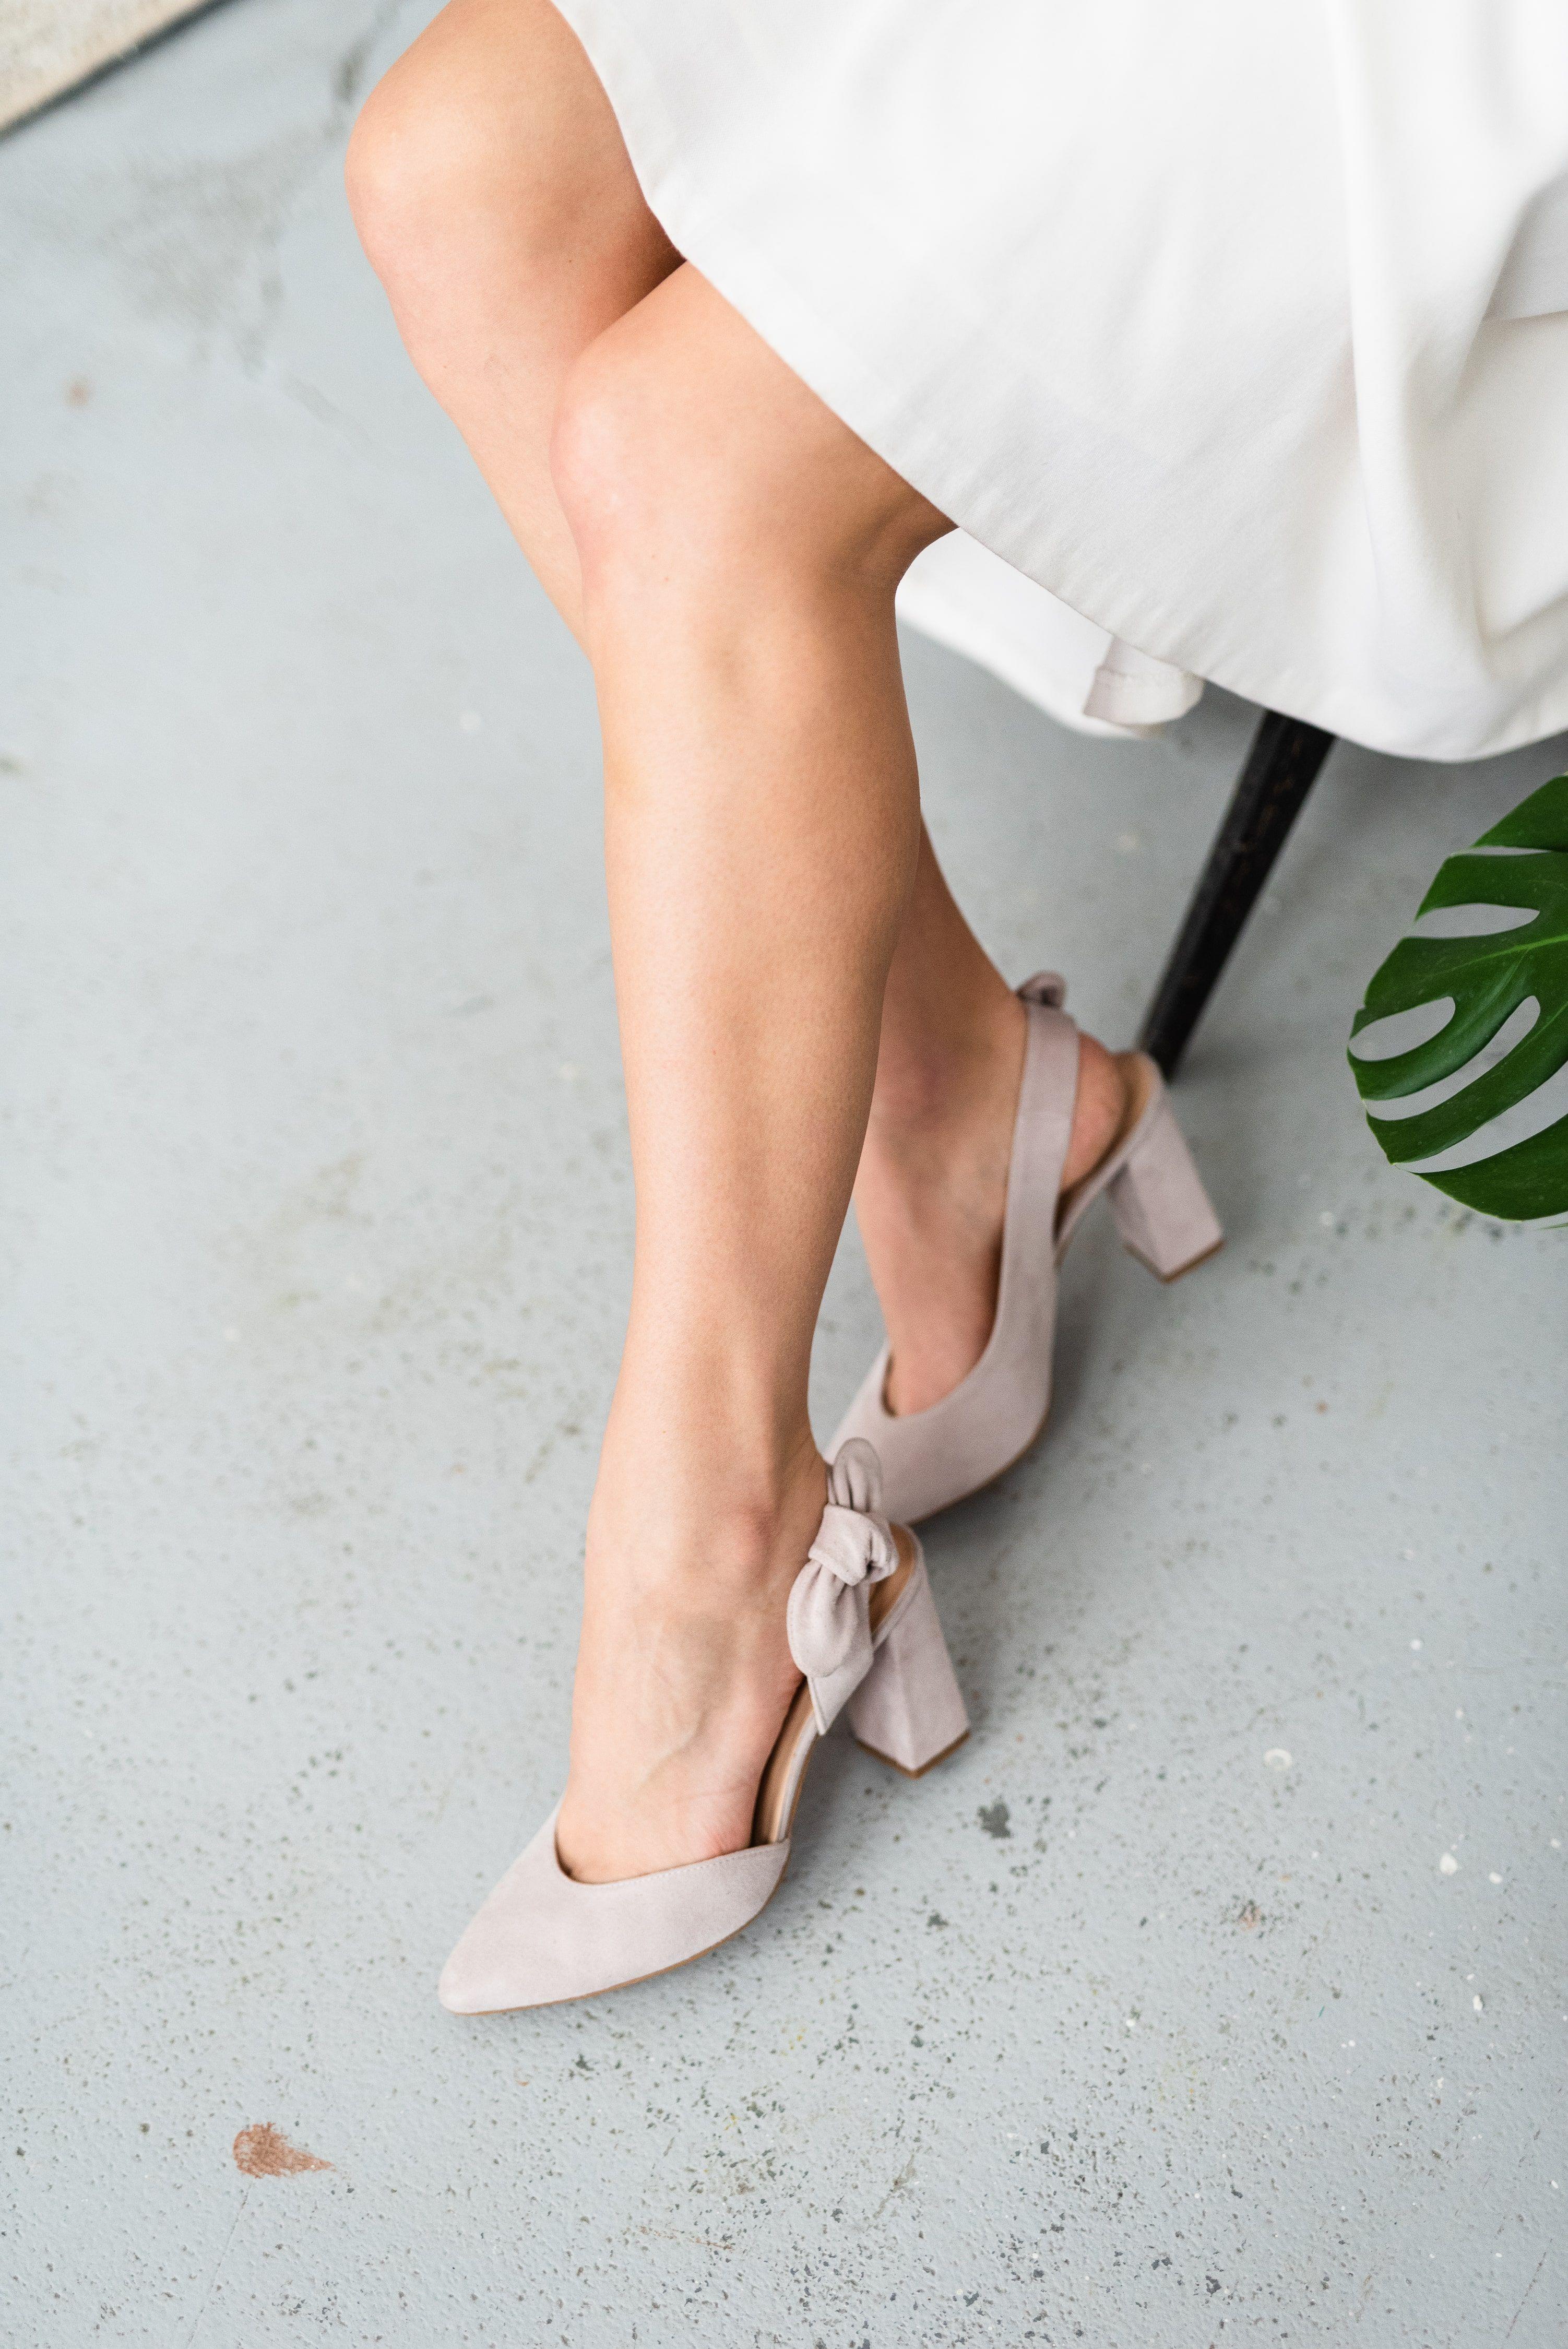 Jak Wybrac Buty Na Slub White Heels Wedding Heels Wedding Heels